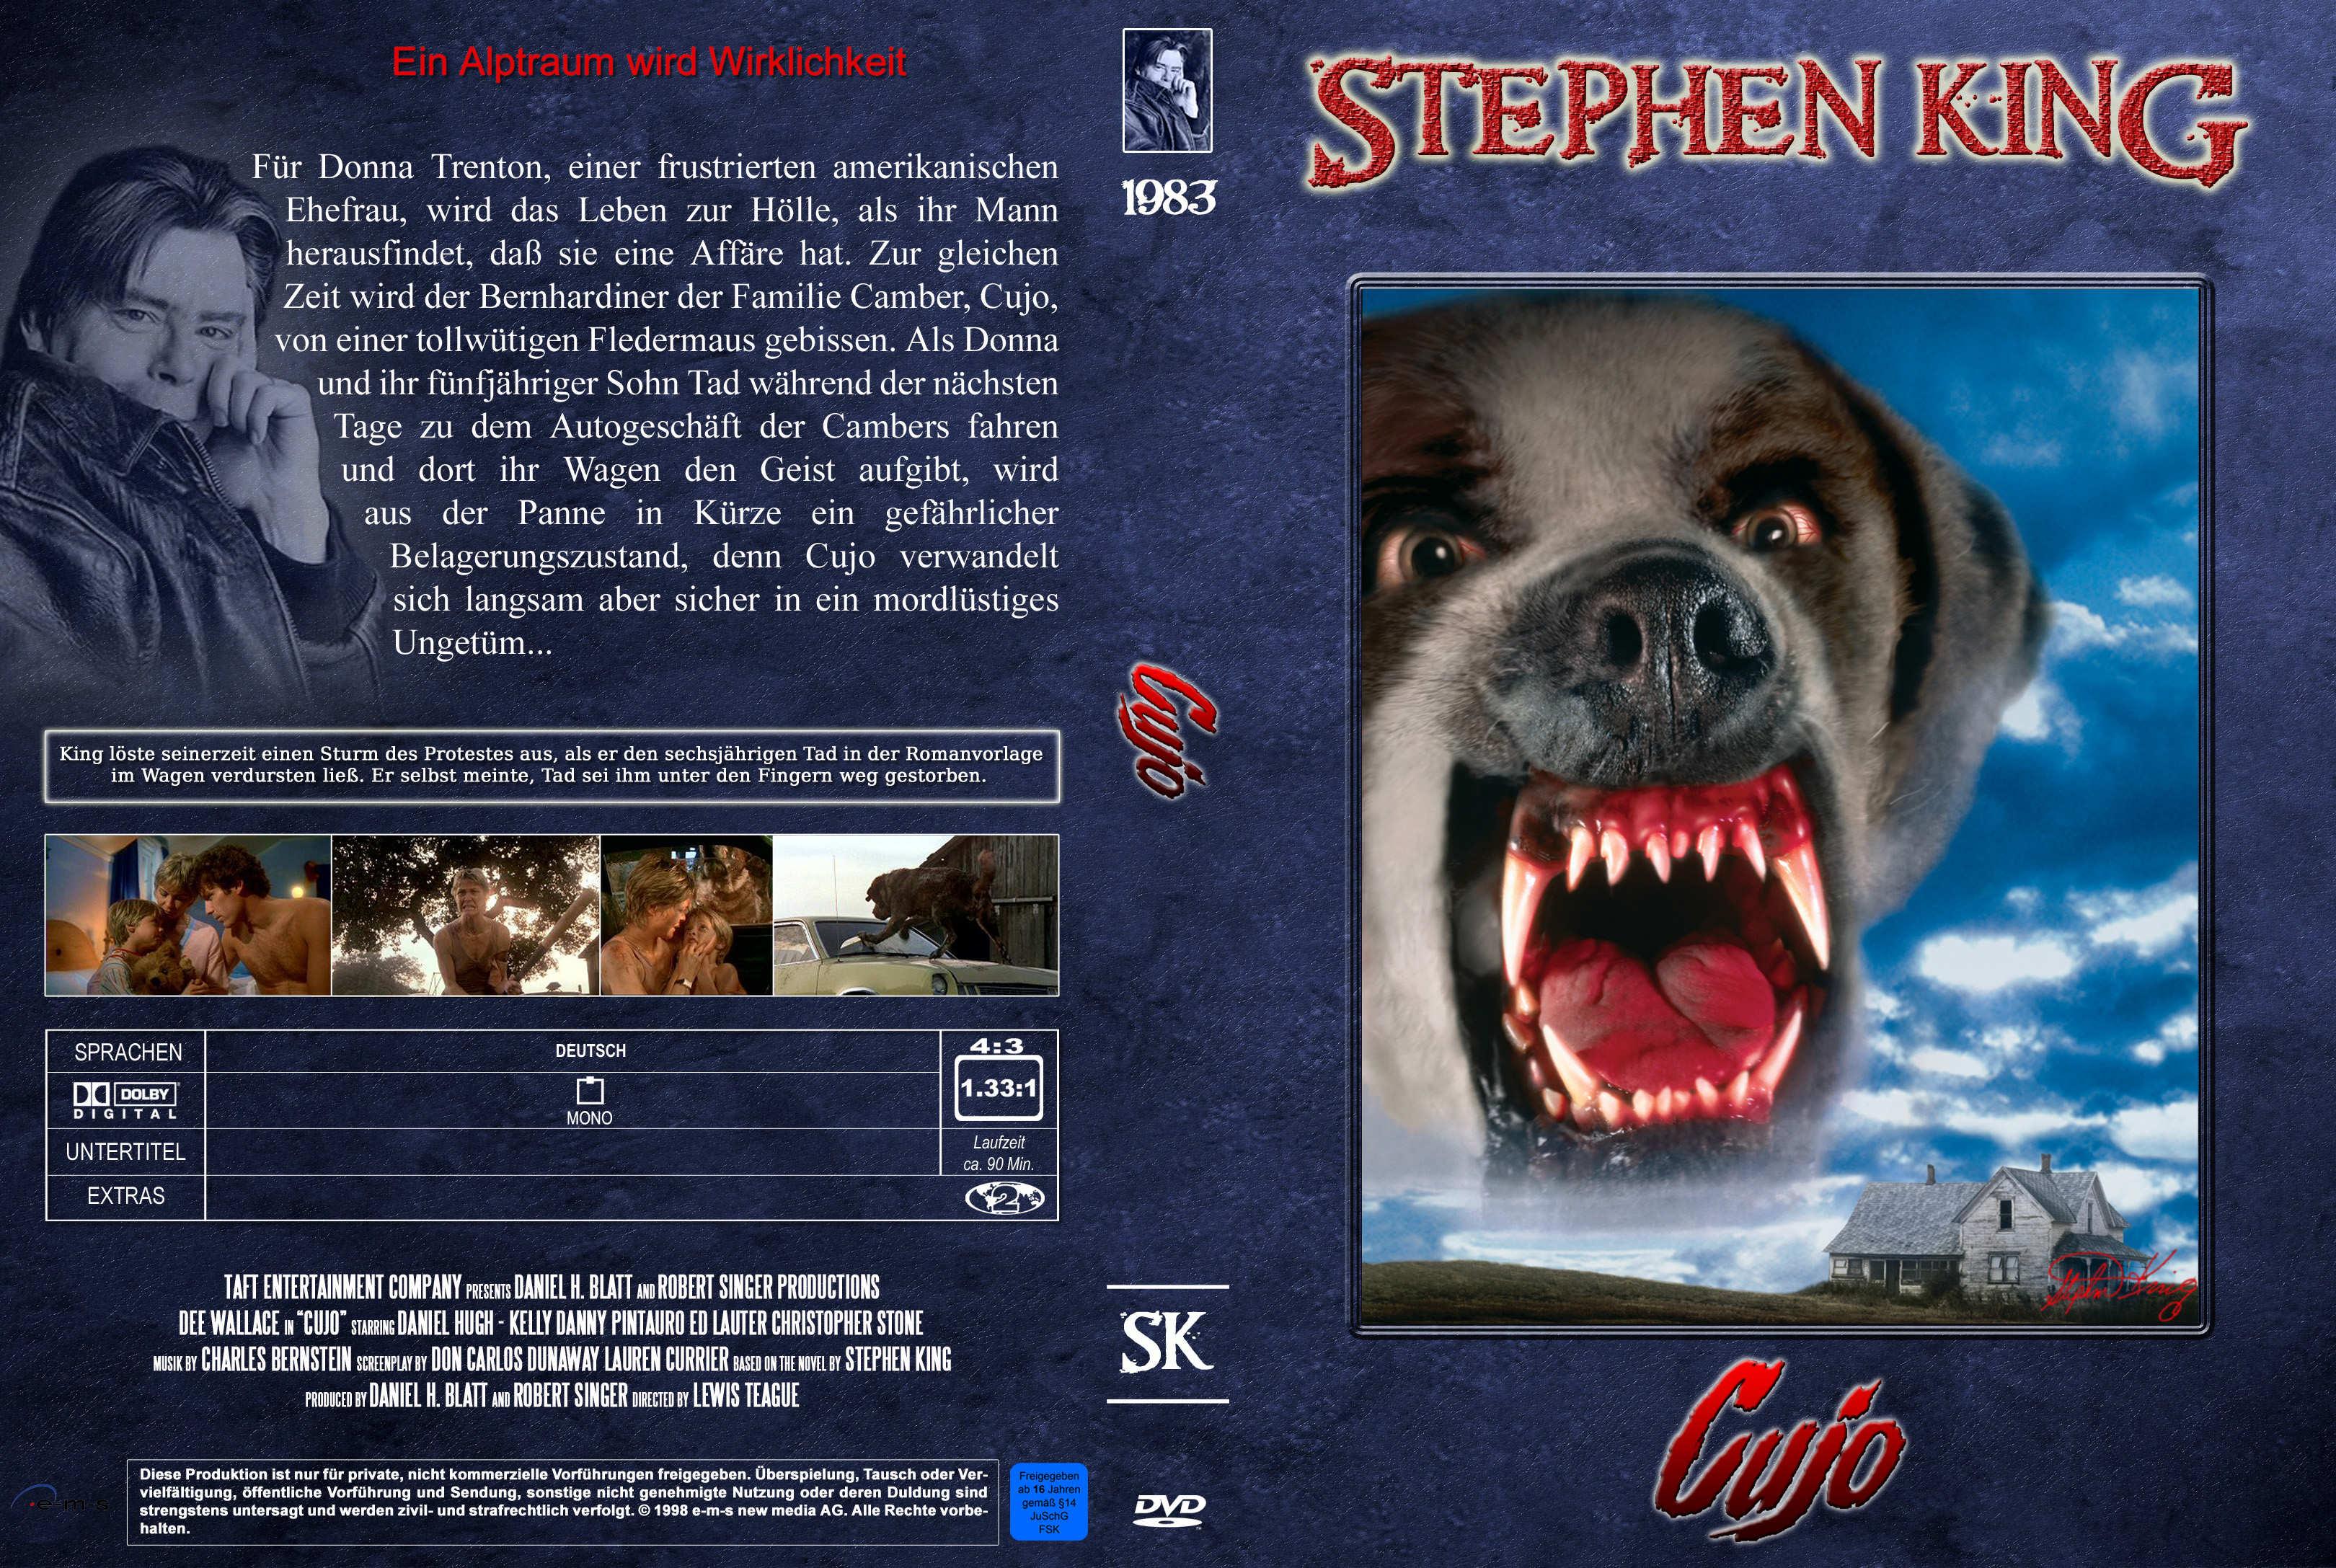 Lot 3 Stephen King writing as Richard Bachman Four Early Novels Regulators Blaze